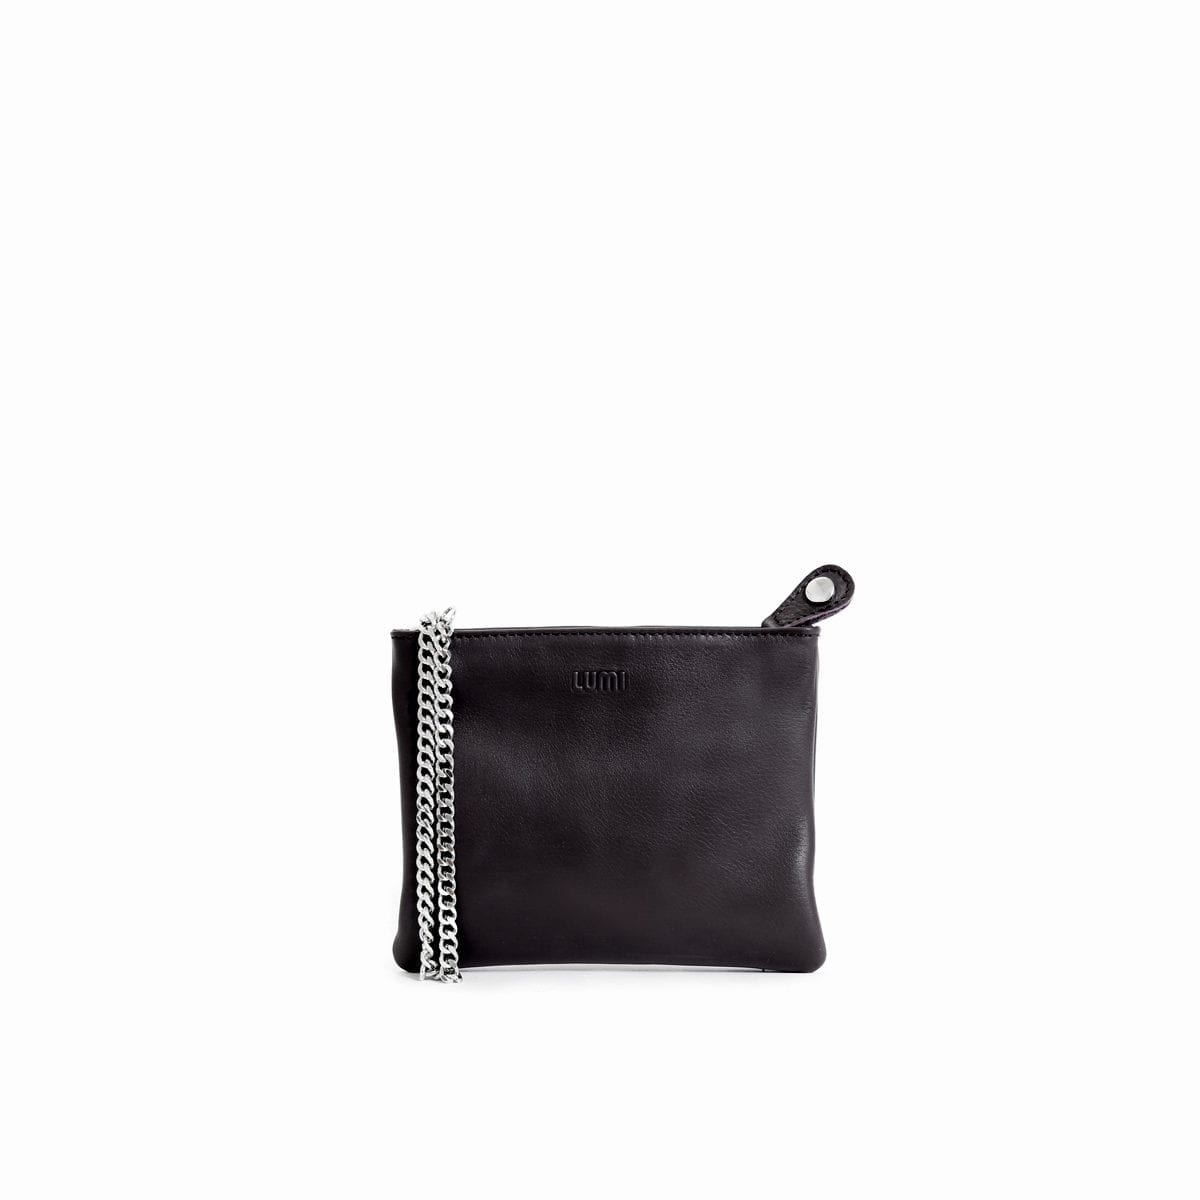 modern techniques release info on exquisite design Laura Envelope Clutch Black